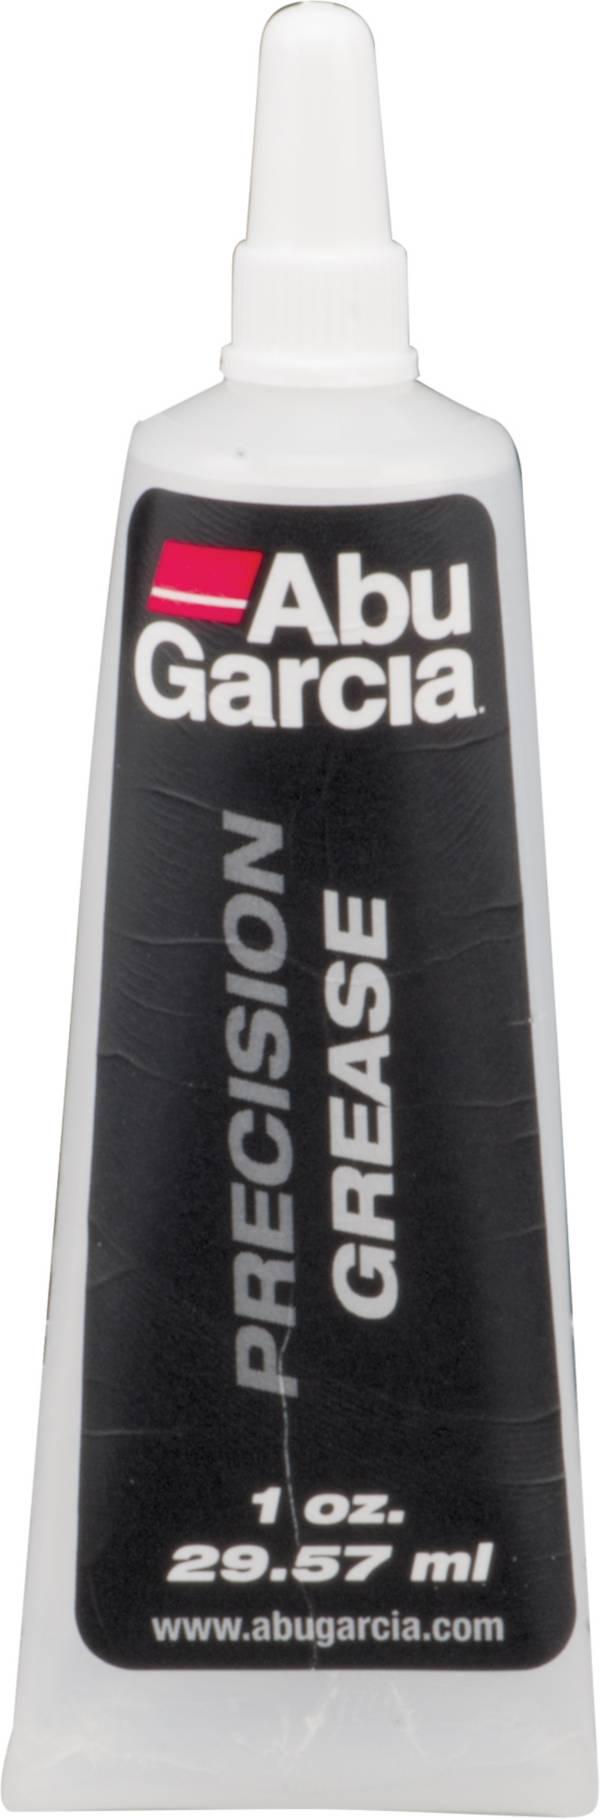 Abu Garcia Reel Grease product image